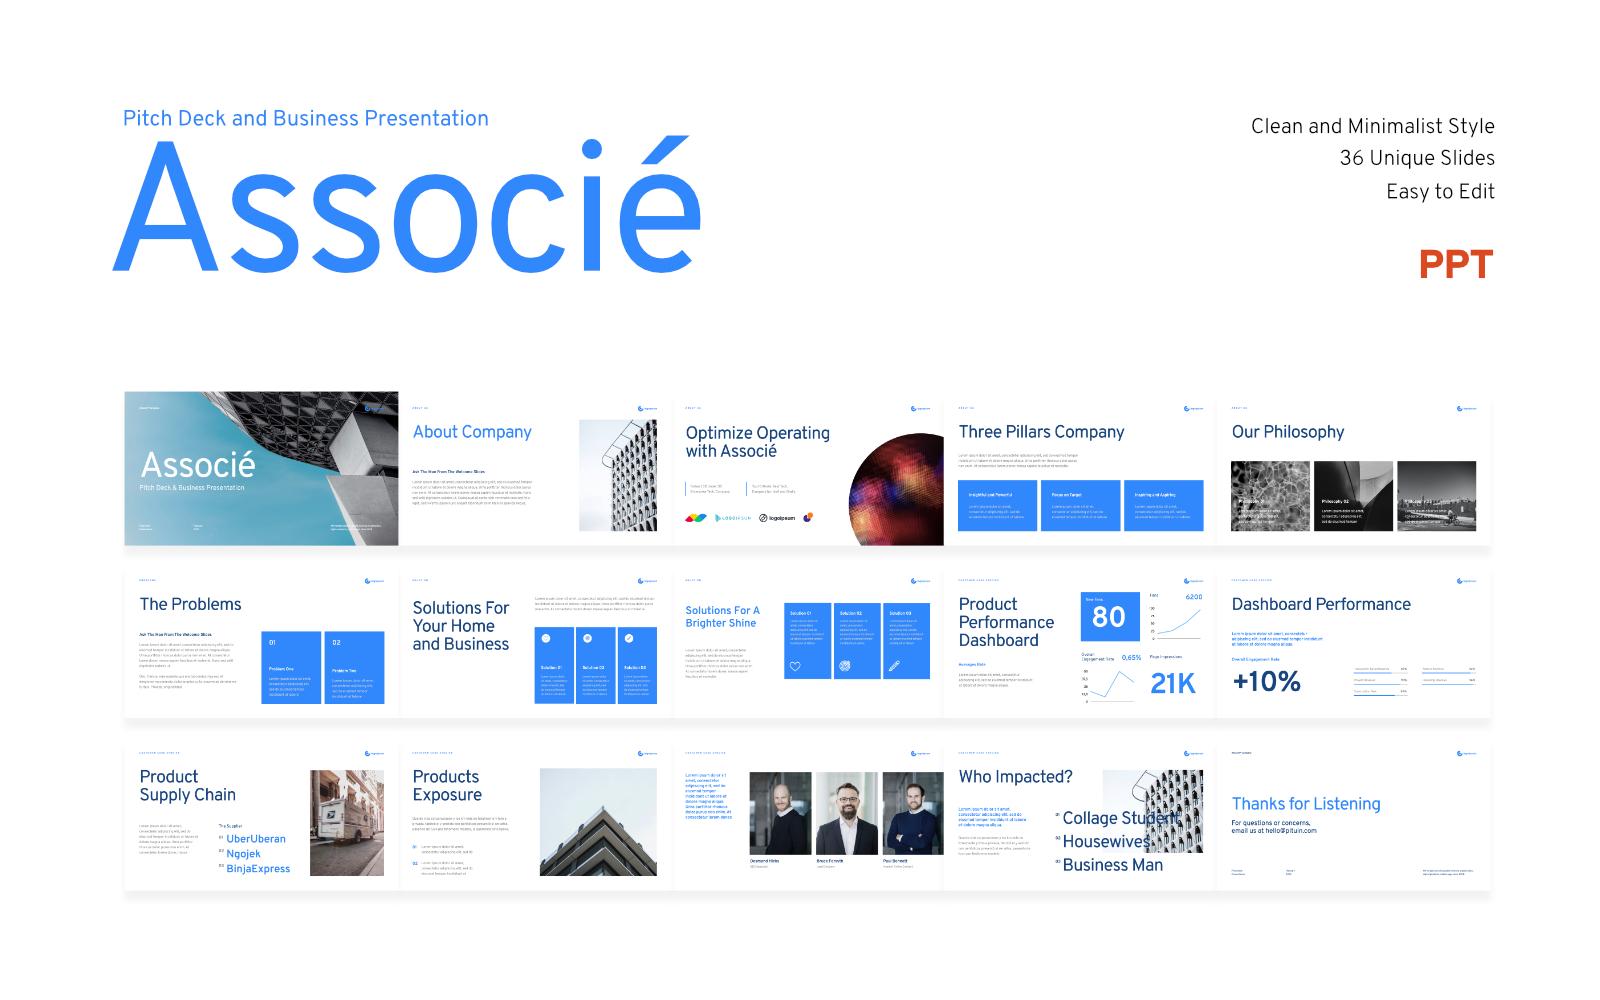 Associe - Pitch Deck Business Presentation - Powerpoint Template